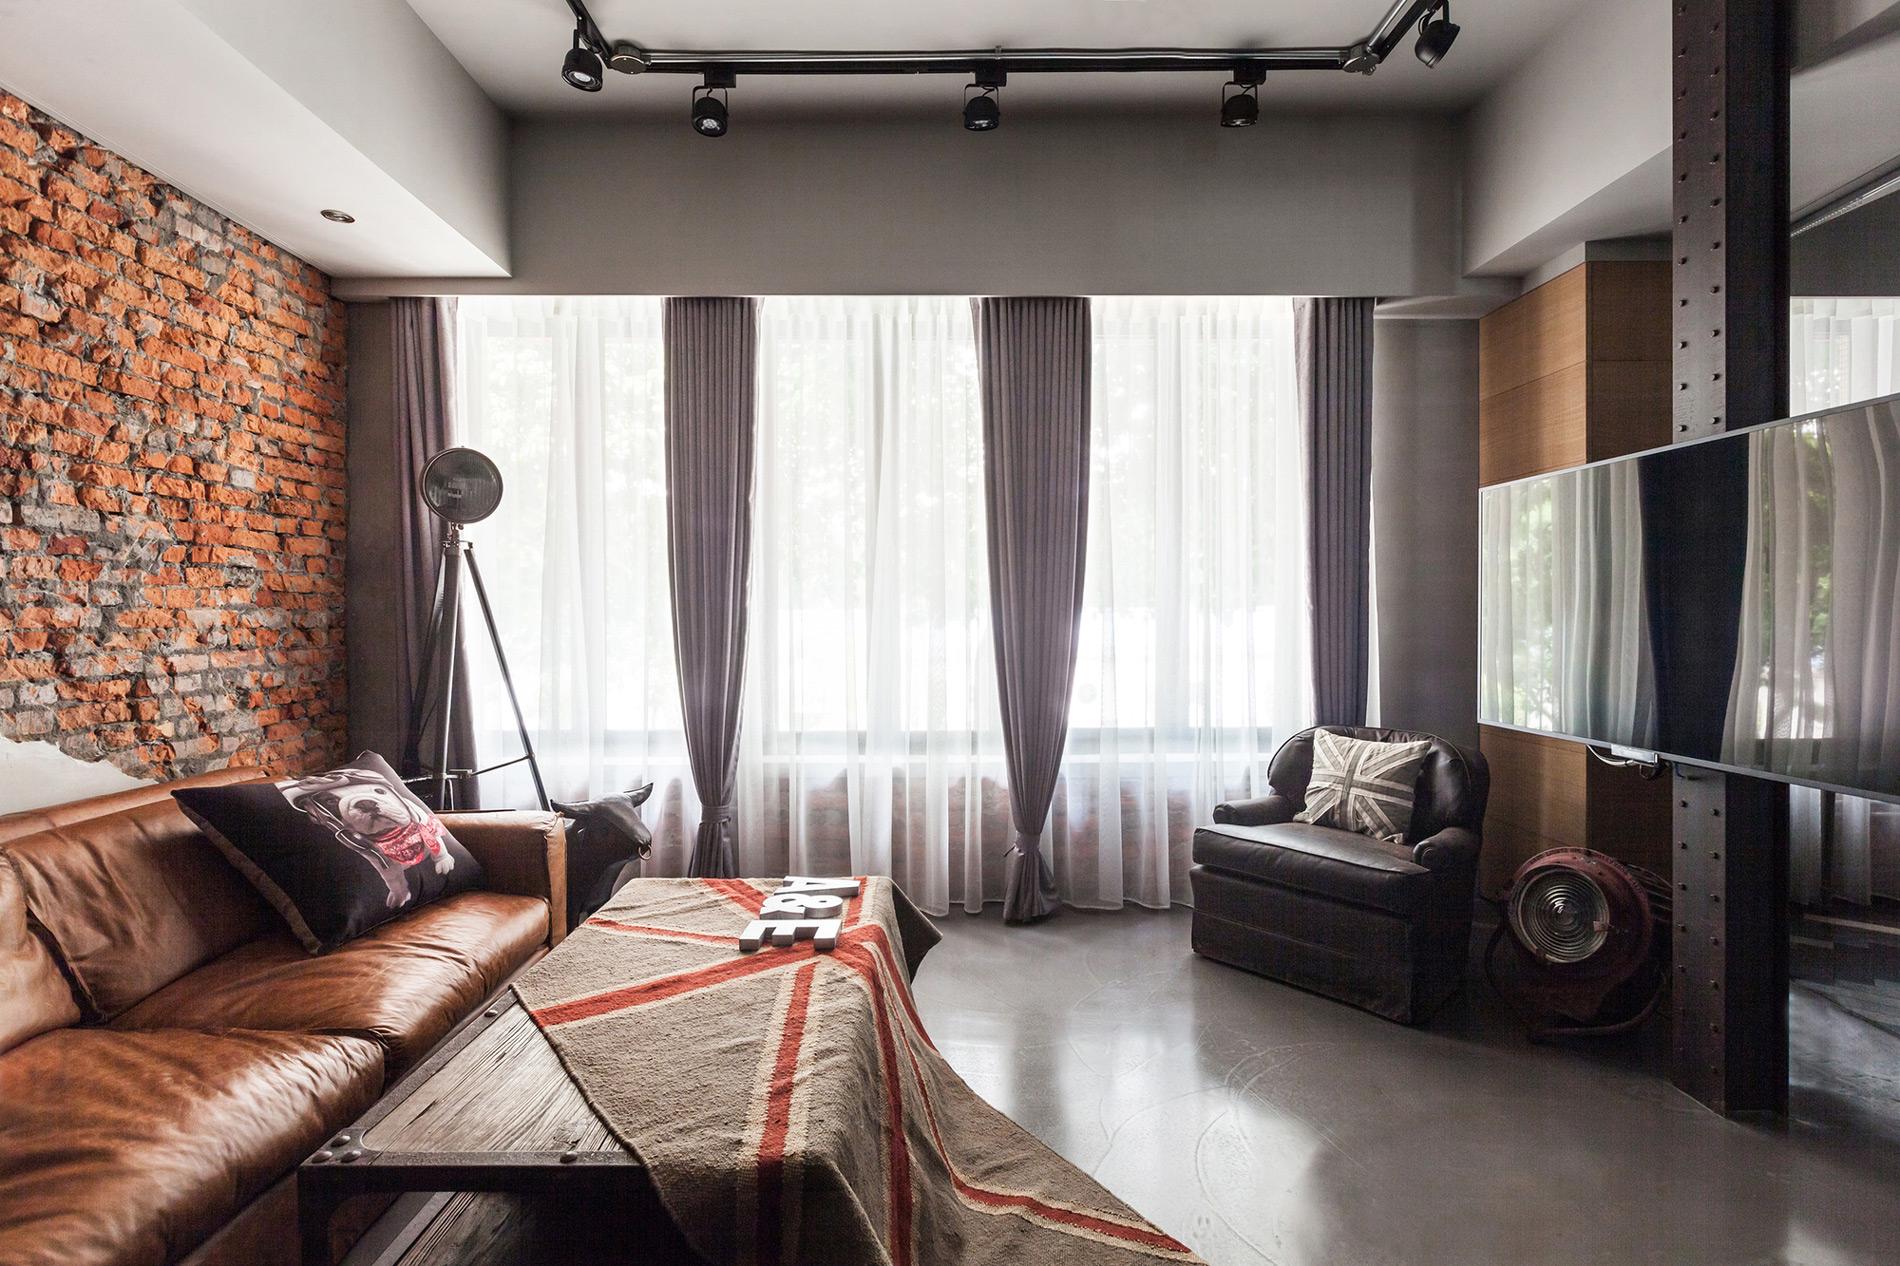 Apartment Refurbishment / CHI-TORCH Interior Design (11)